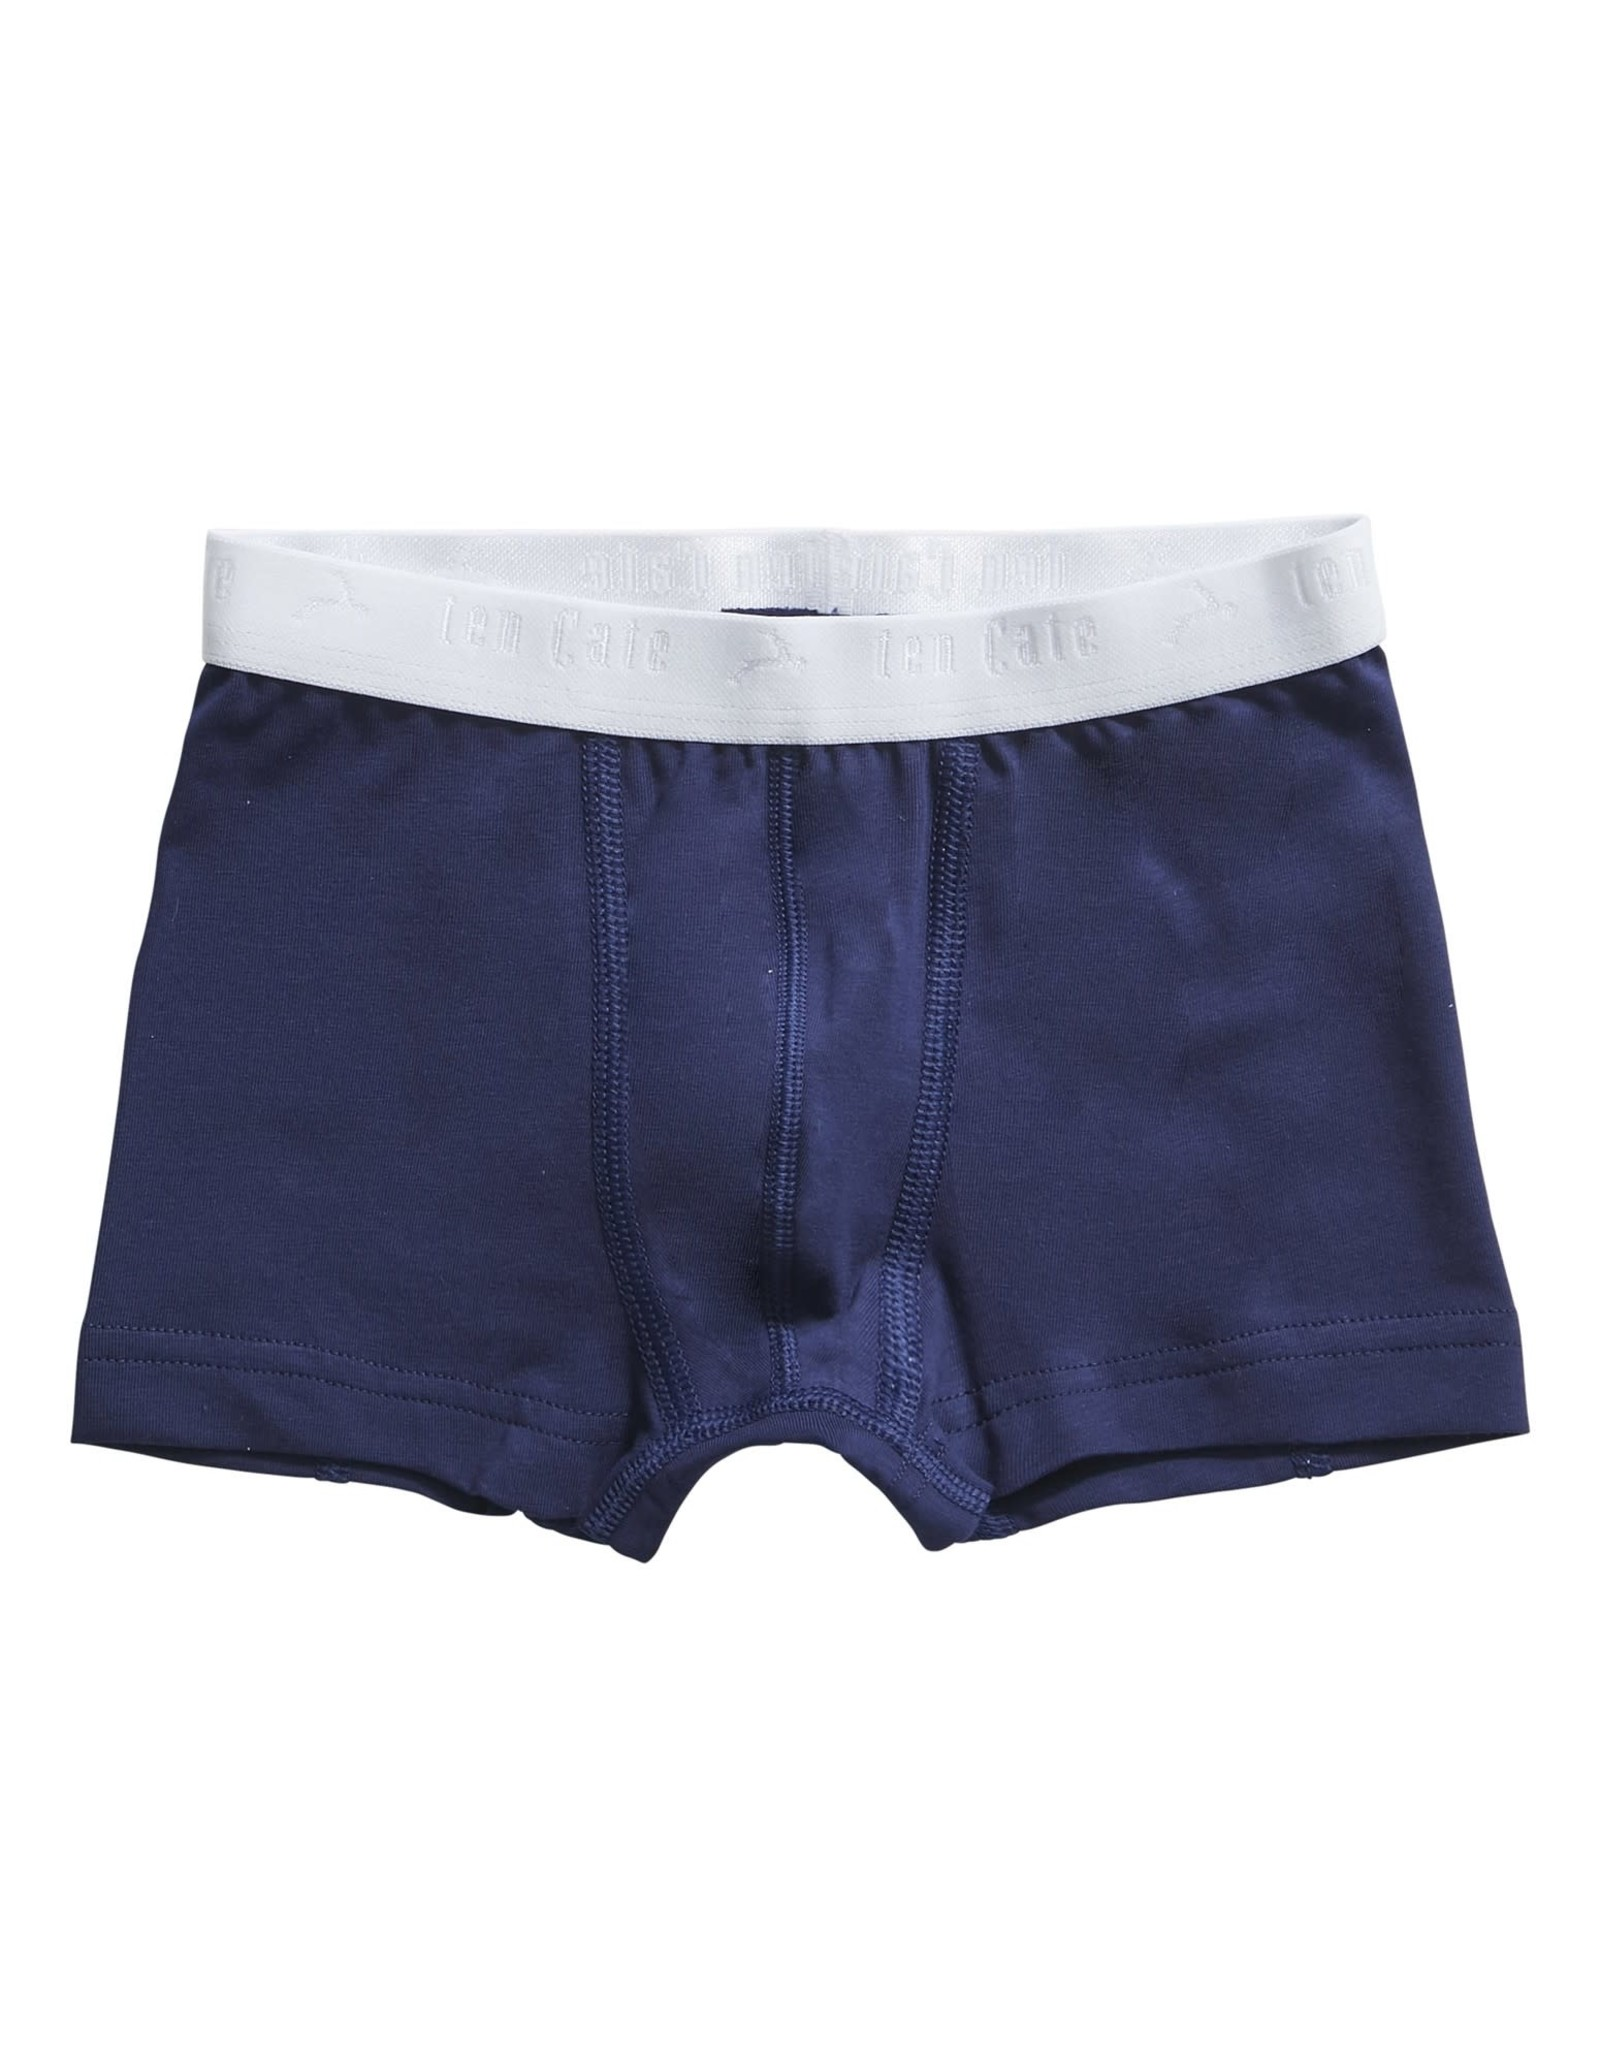 Ten Cate Basis boys shorts 2 pack stripe medieval blue